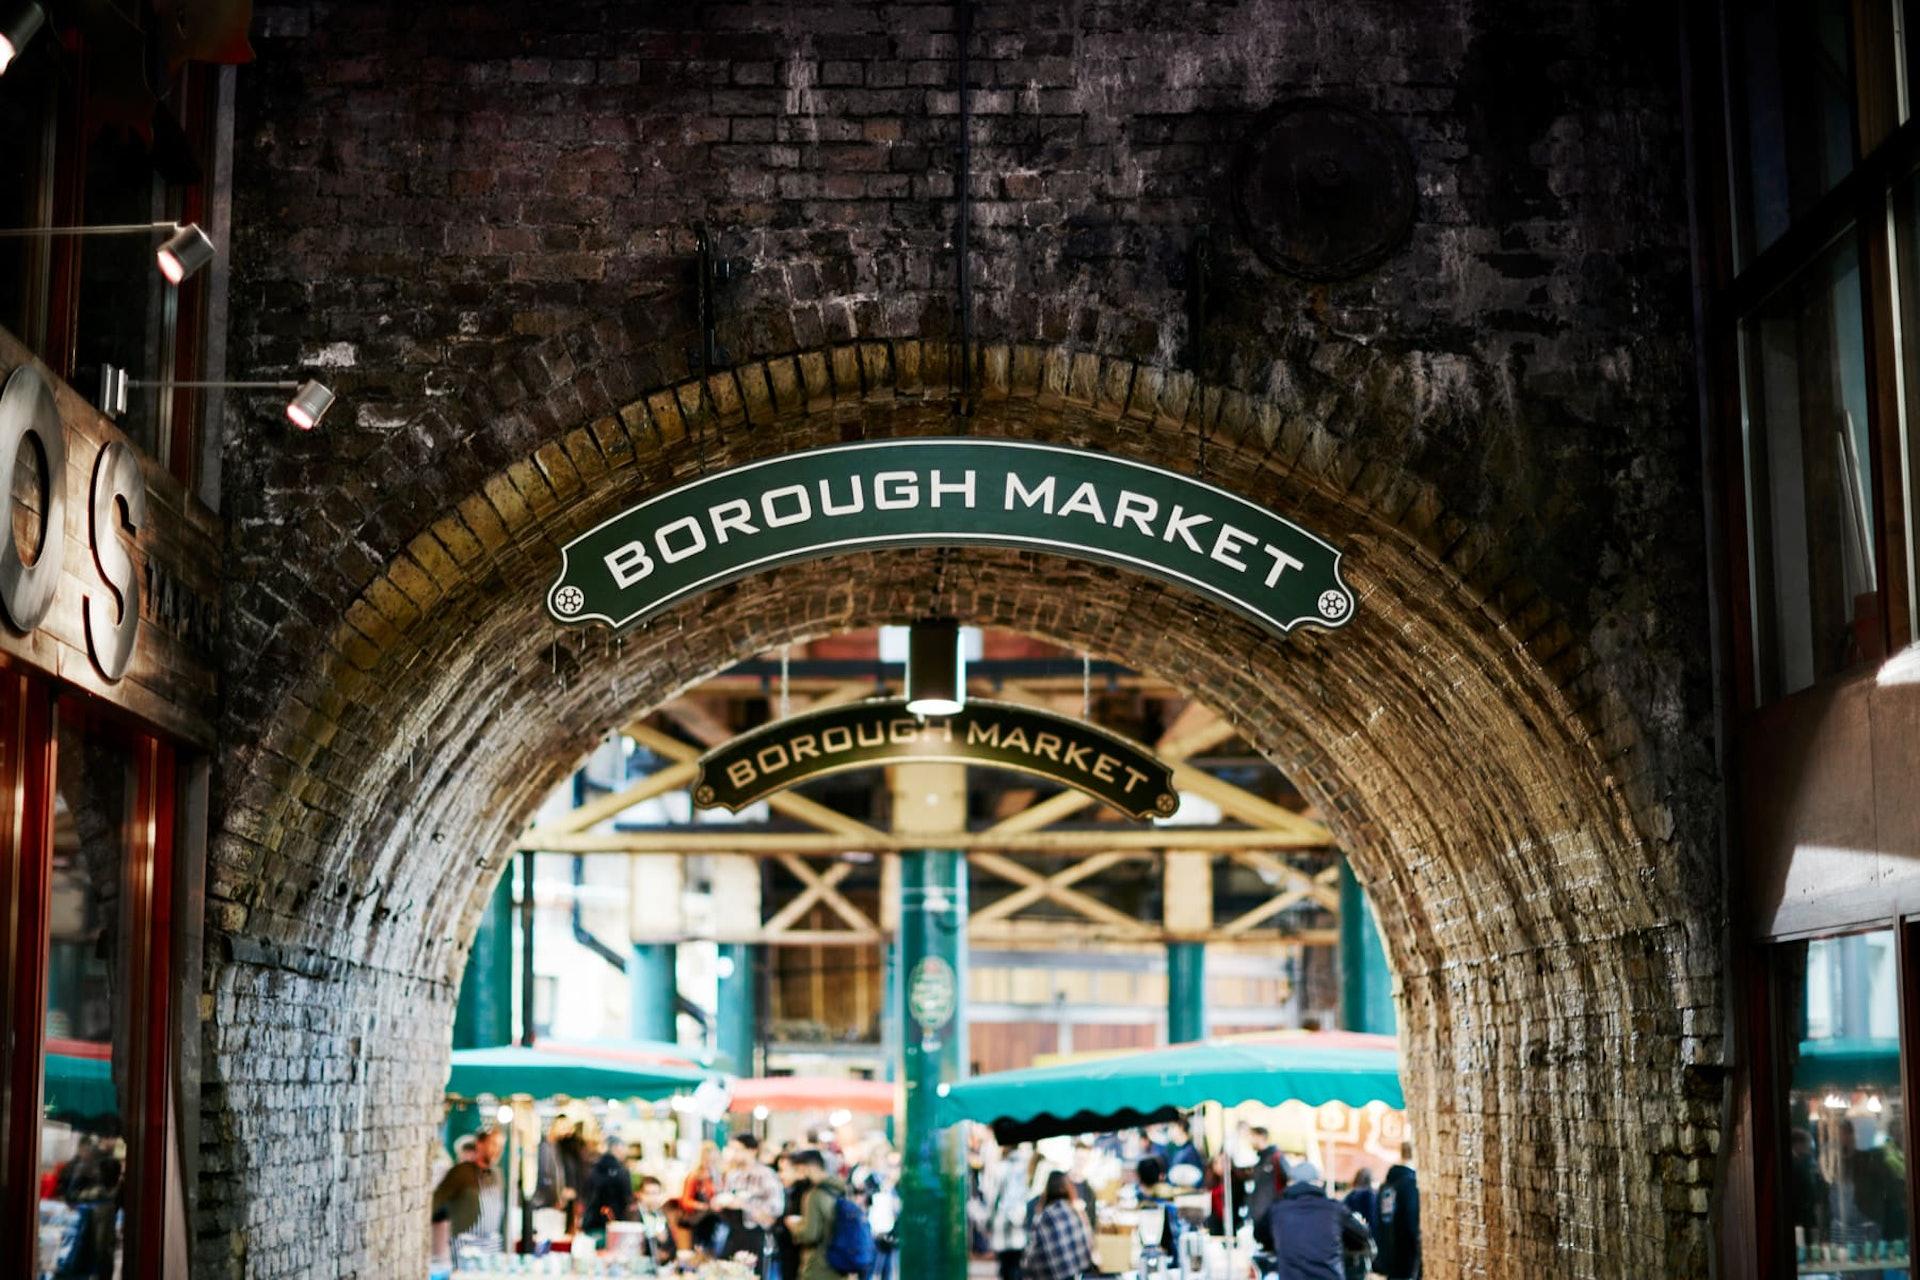 Exterior of Borough Market, London